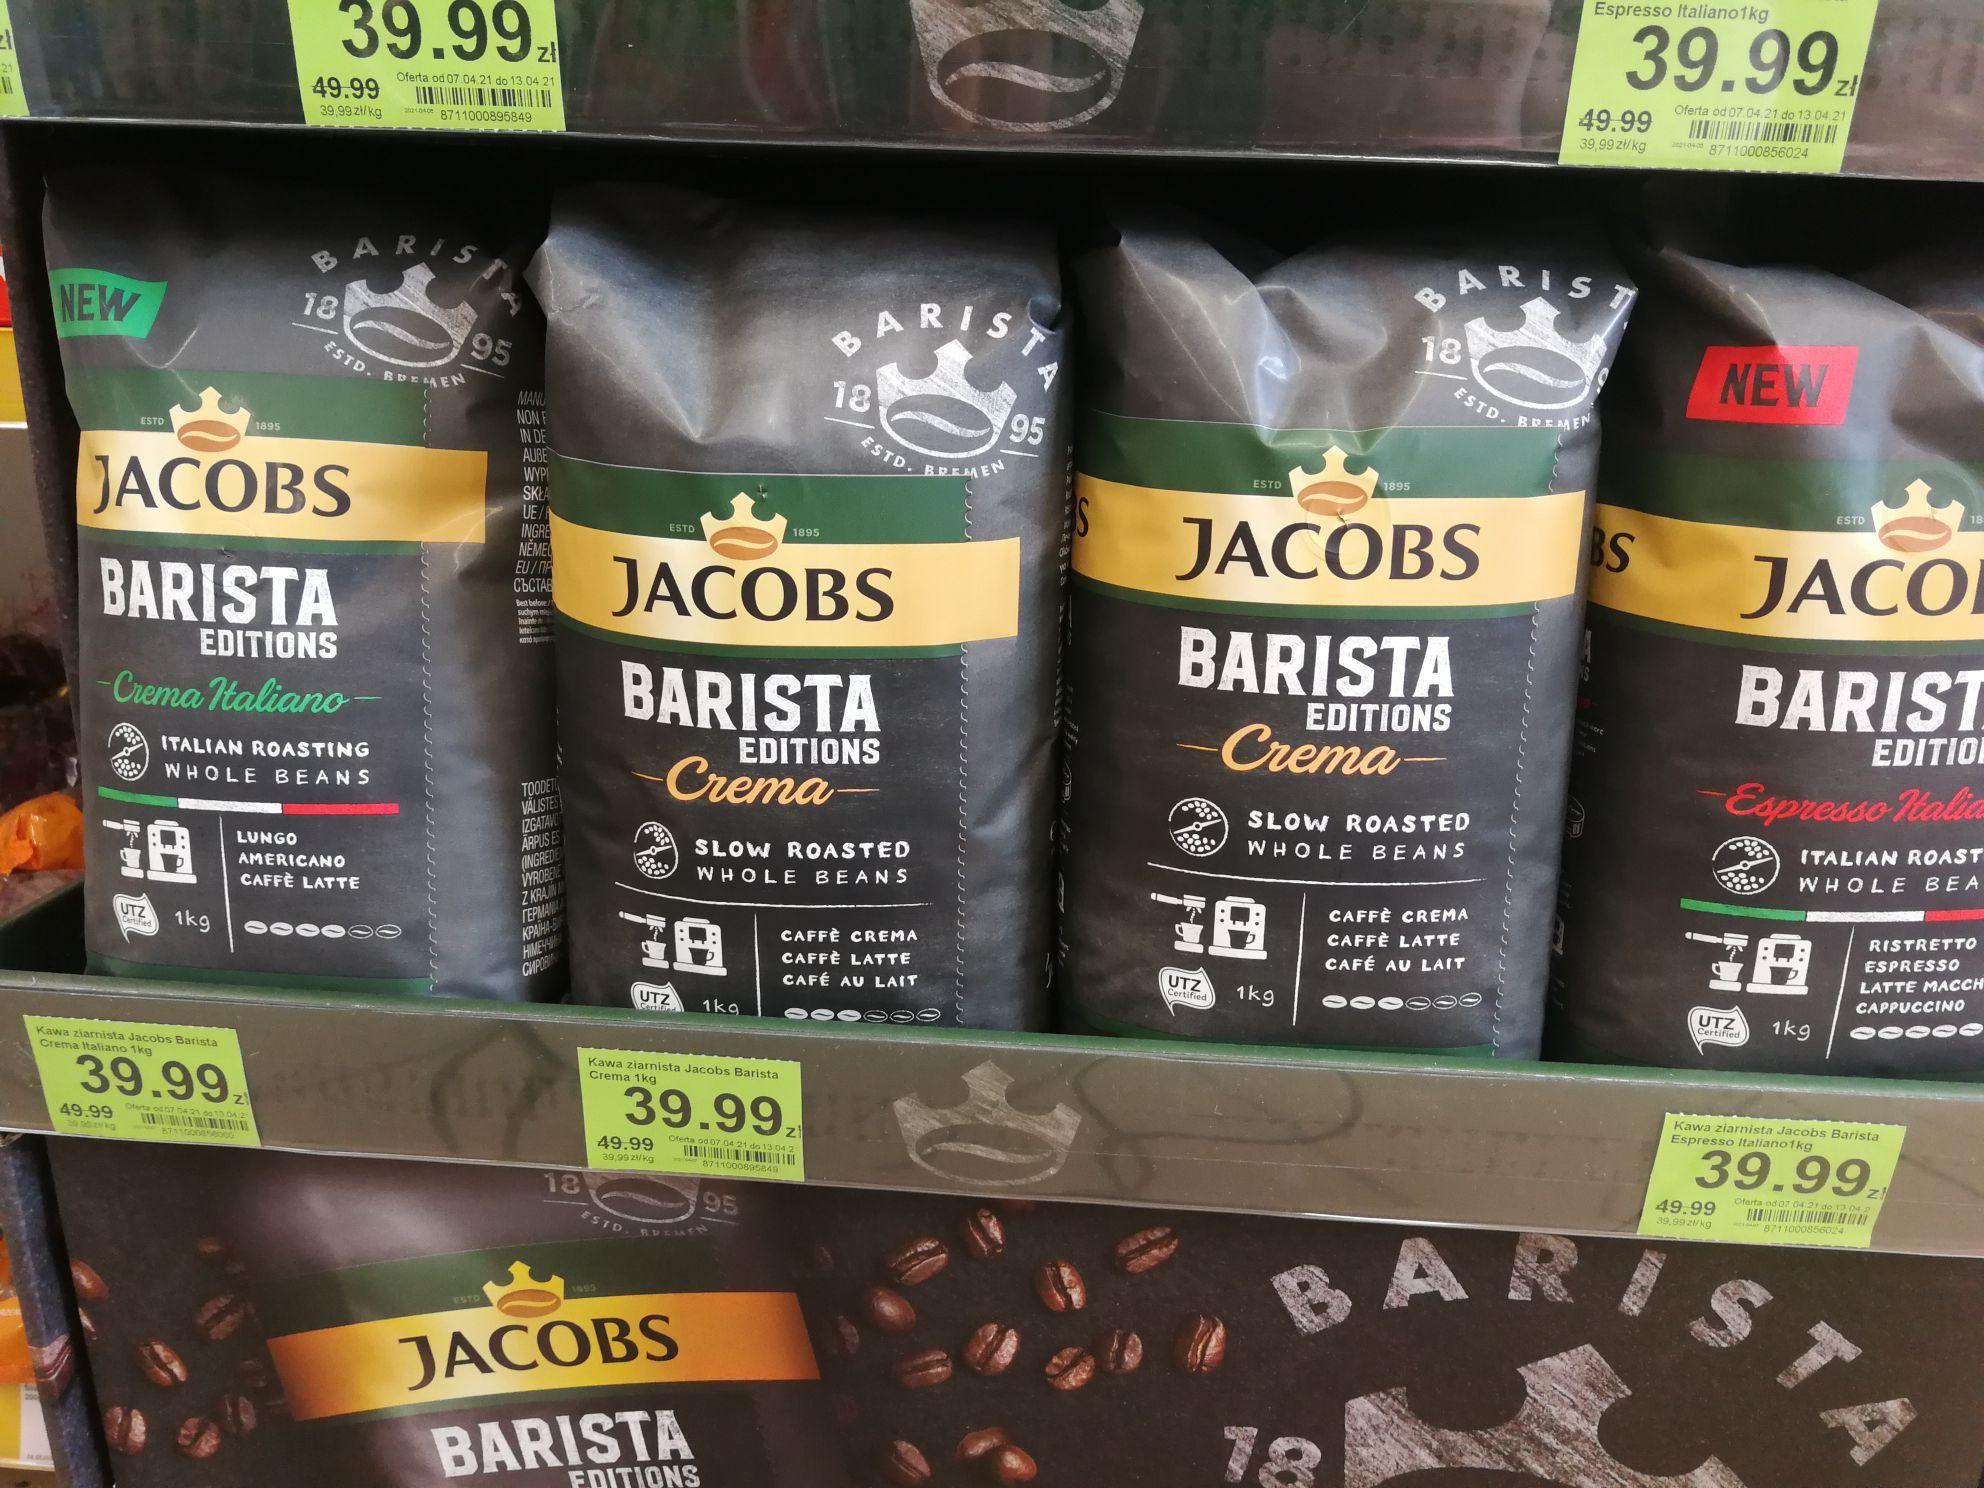 Jacobs Barista 1kg